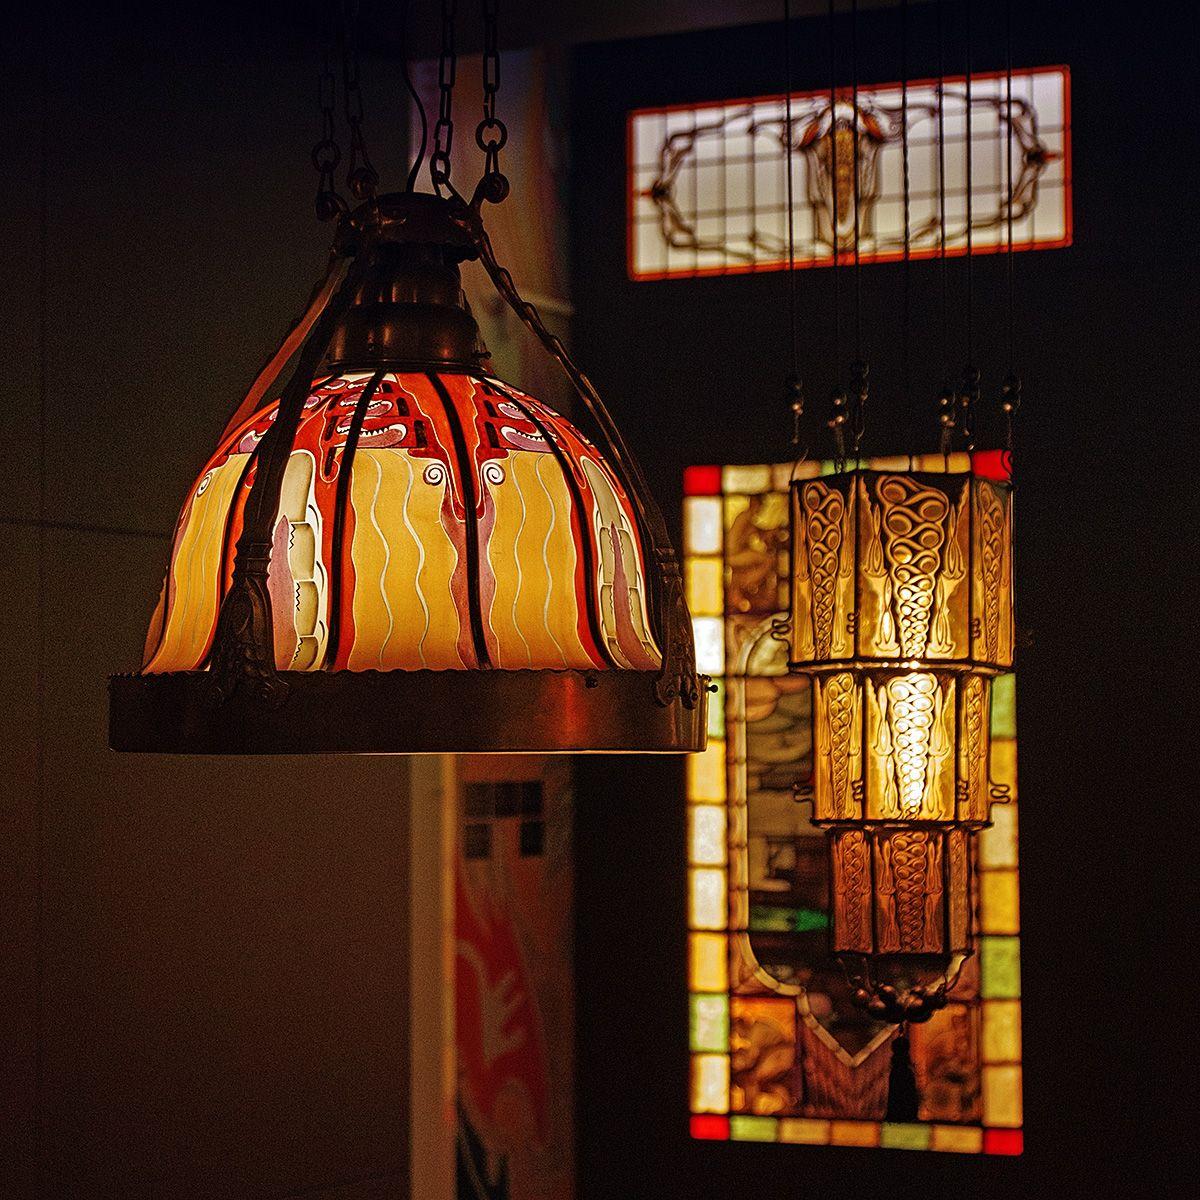 Pin Van Claudia Gagnon Op Amsterdamse School Pyrochrome Lampshades Art Deco Lampen Art Deco Deco